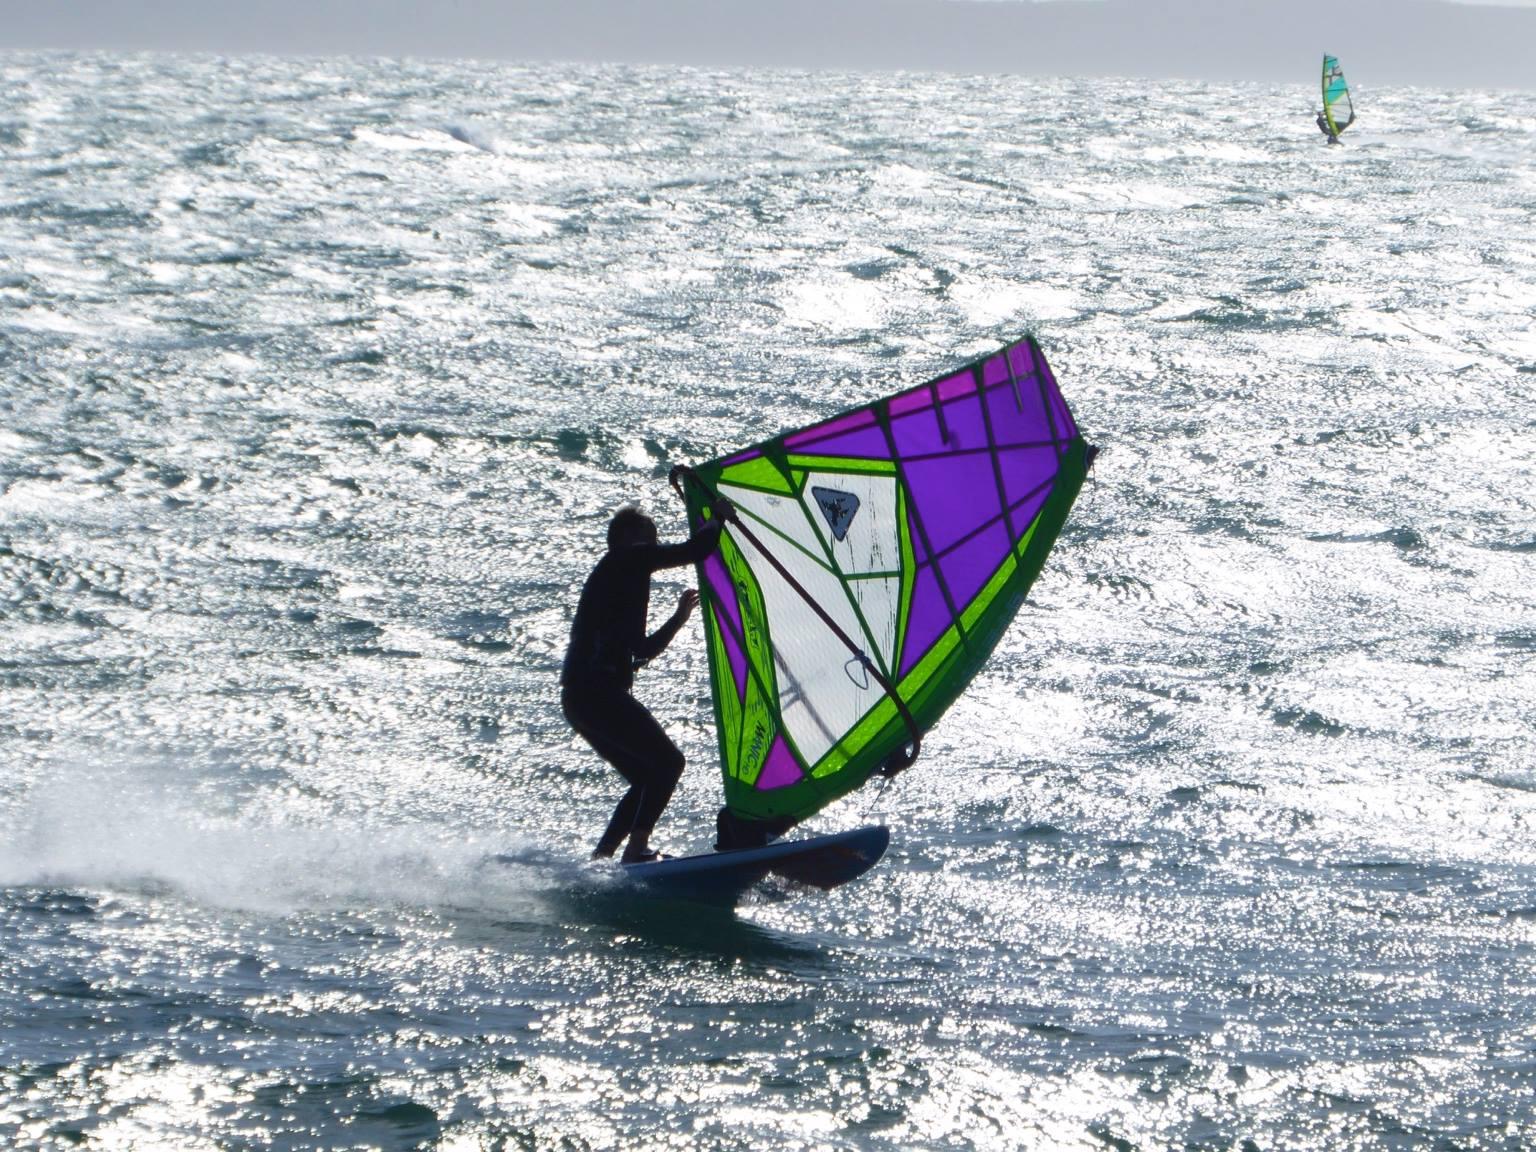 Chris Bolt - Waterbourne Windsurfing Legend